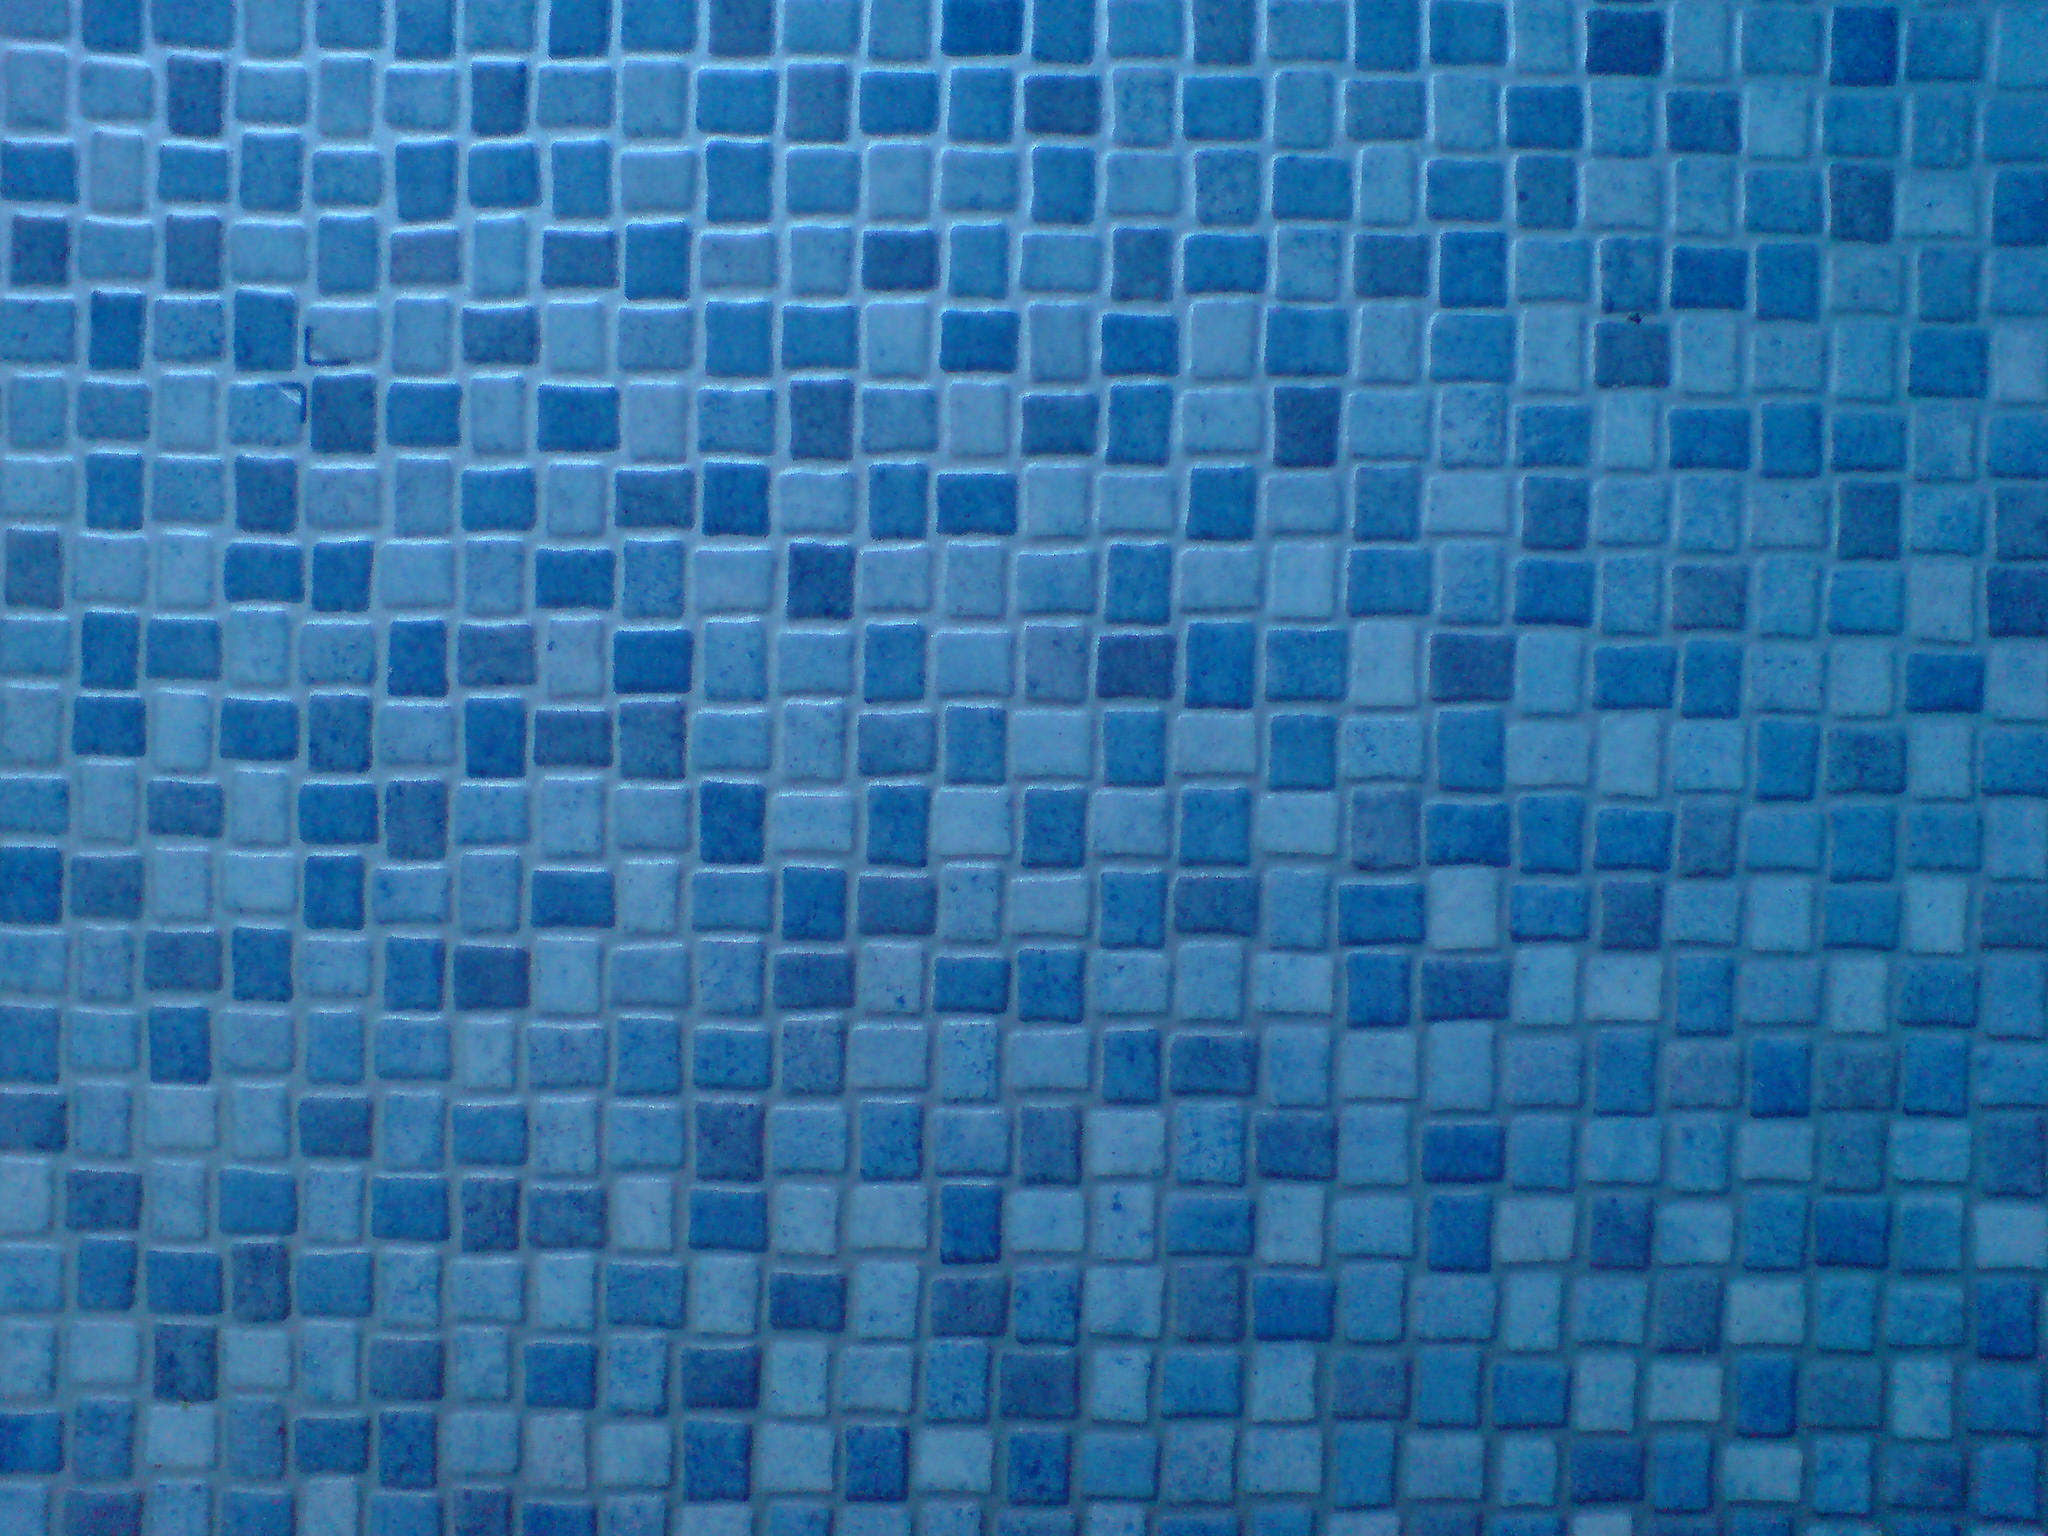 Blue mosaic linoleum by dr druids stock on deviantart for Blue linoleum floor tiles